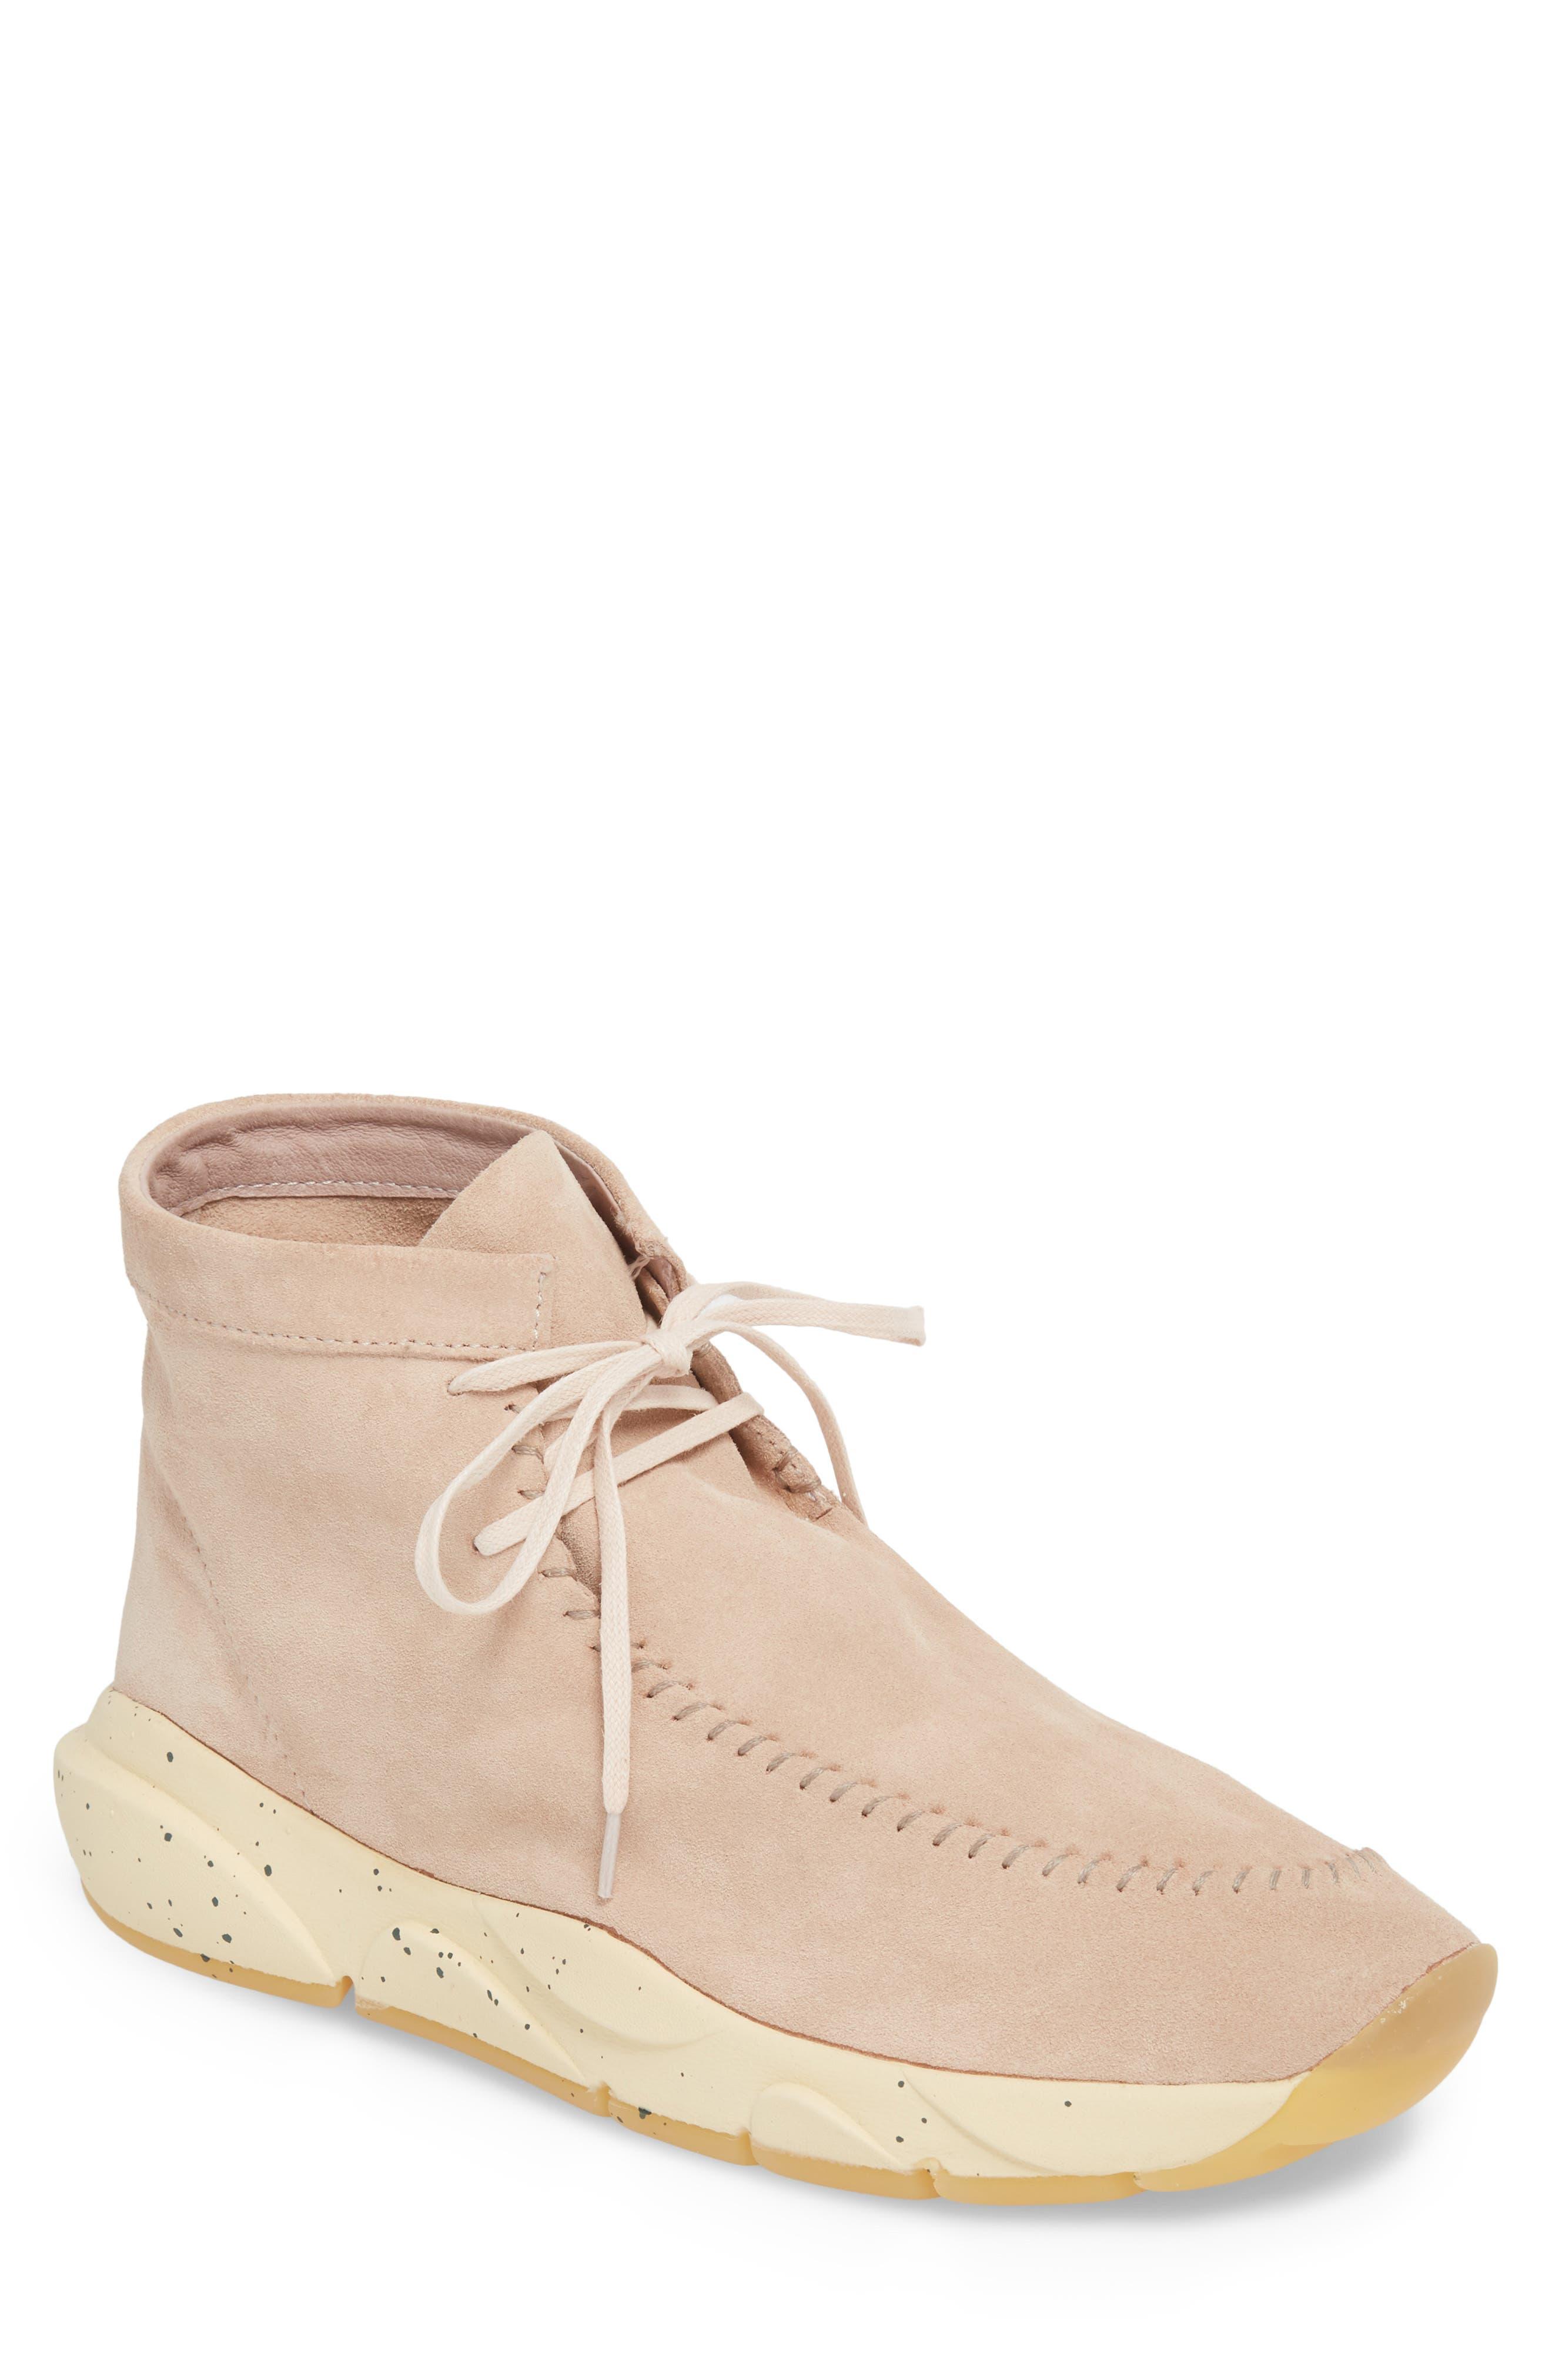 Castas Asymmetrical Chukka Sneaker,                             Main thumbnail 1, color,                             Rose Dust